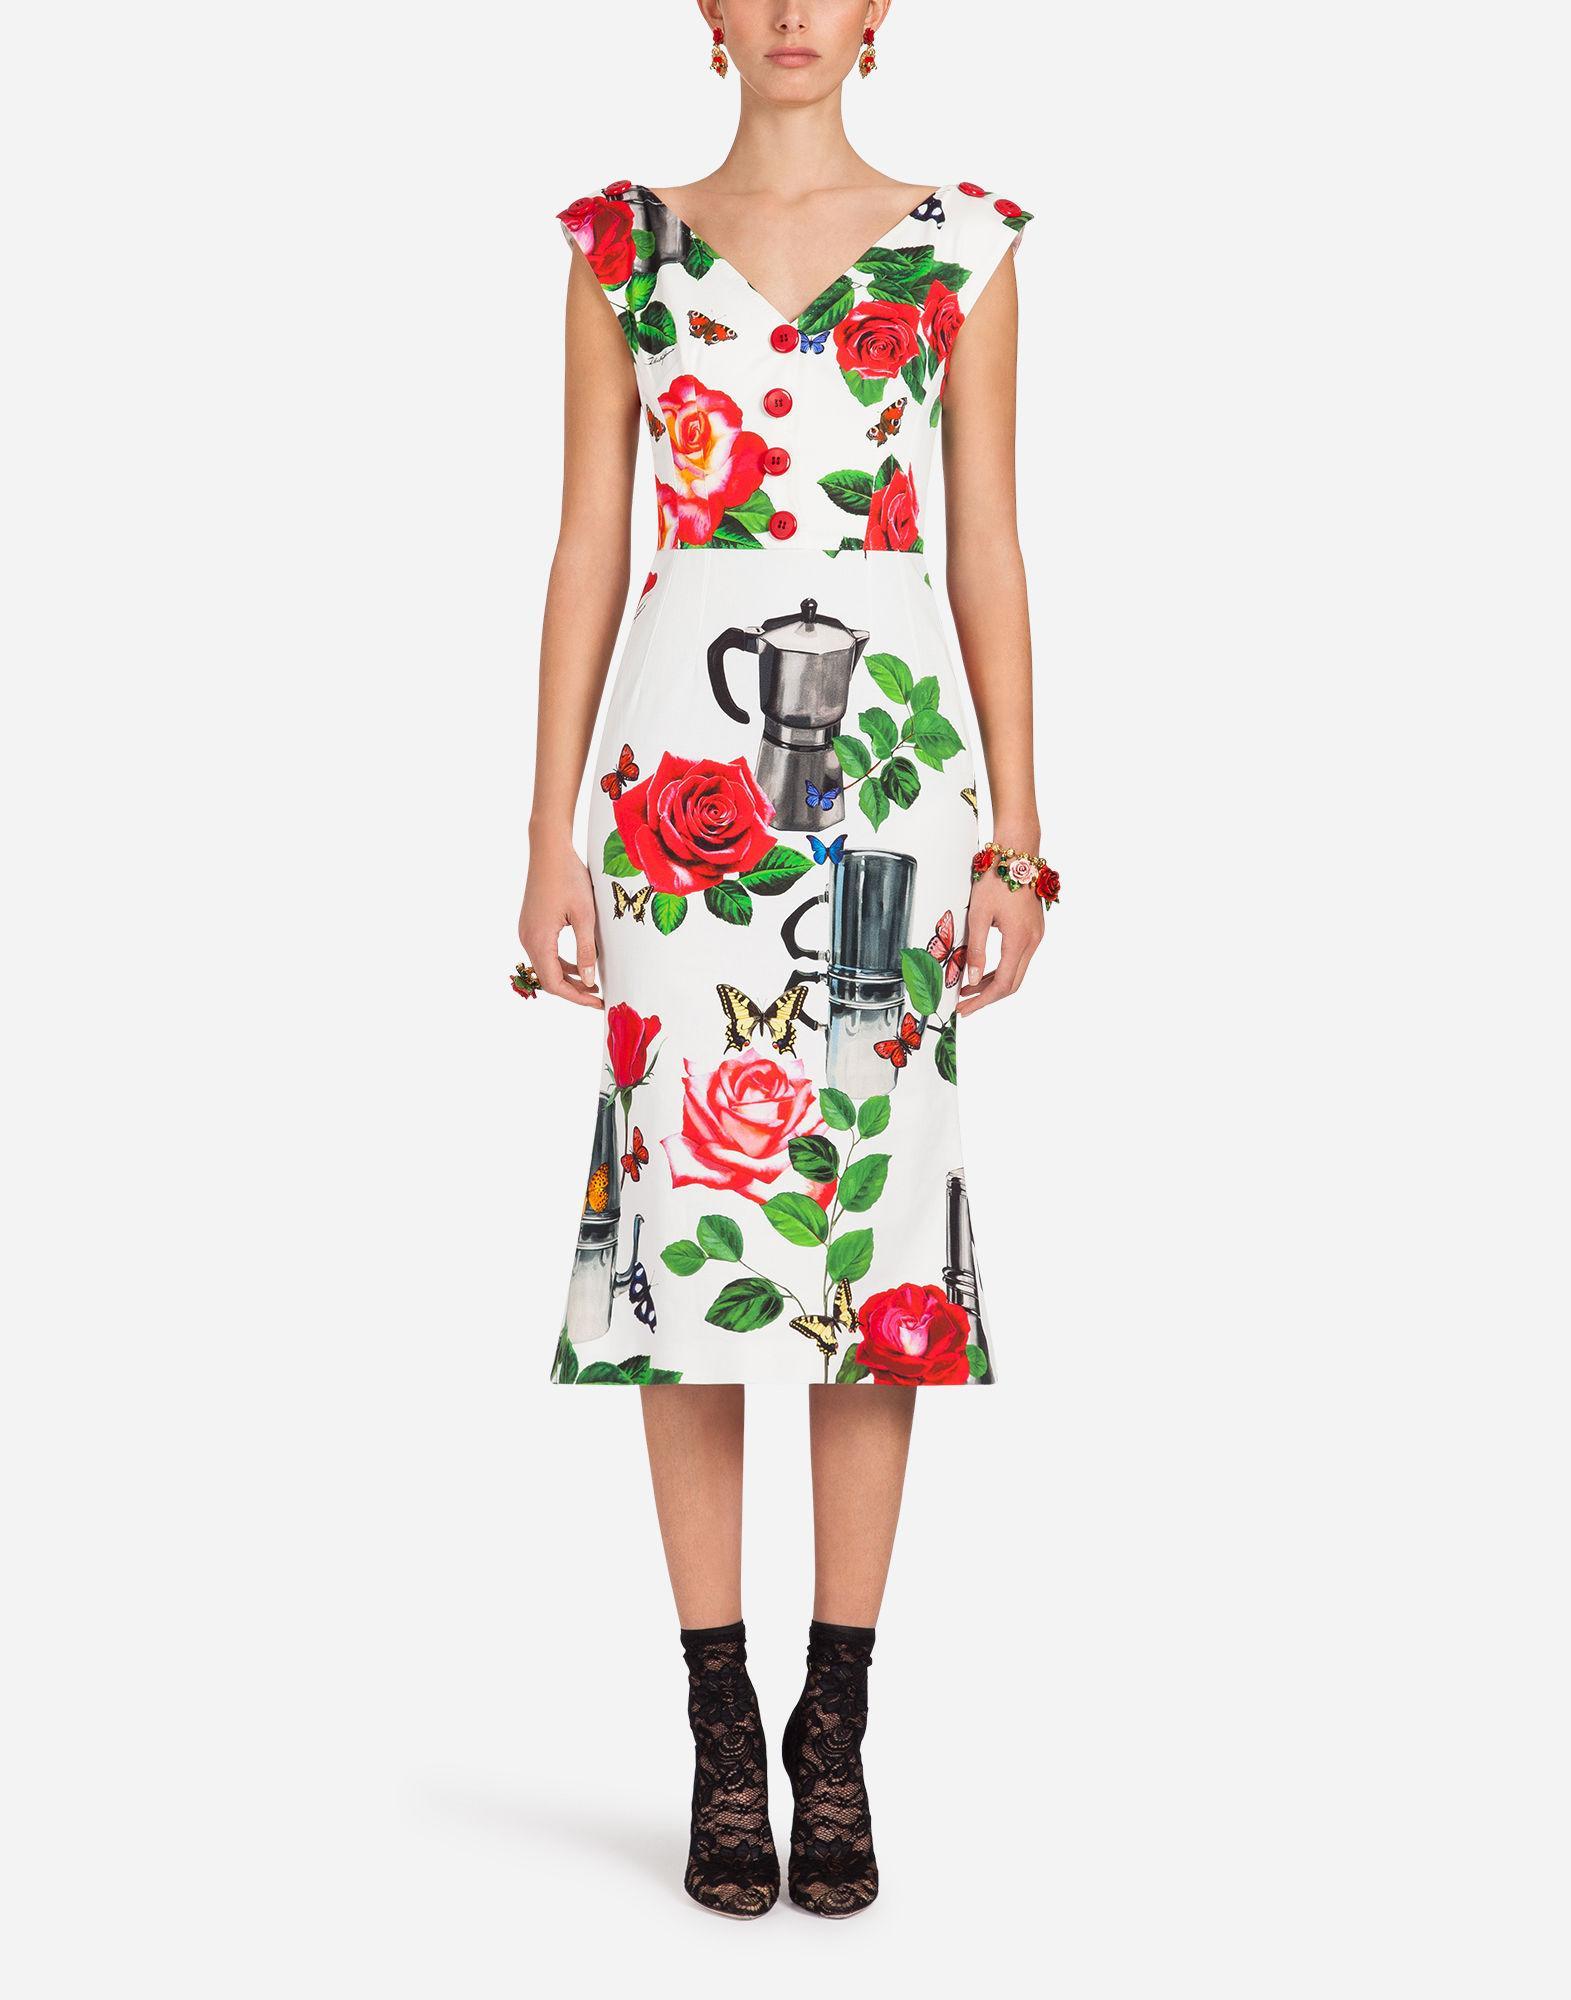 b1395d6ceea Dolce & Gabbana Printed Cotton Drill Dress In White | ModeSens